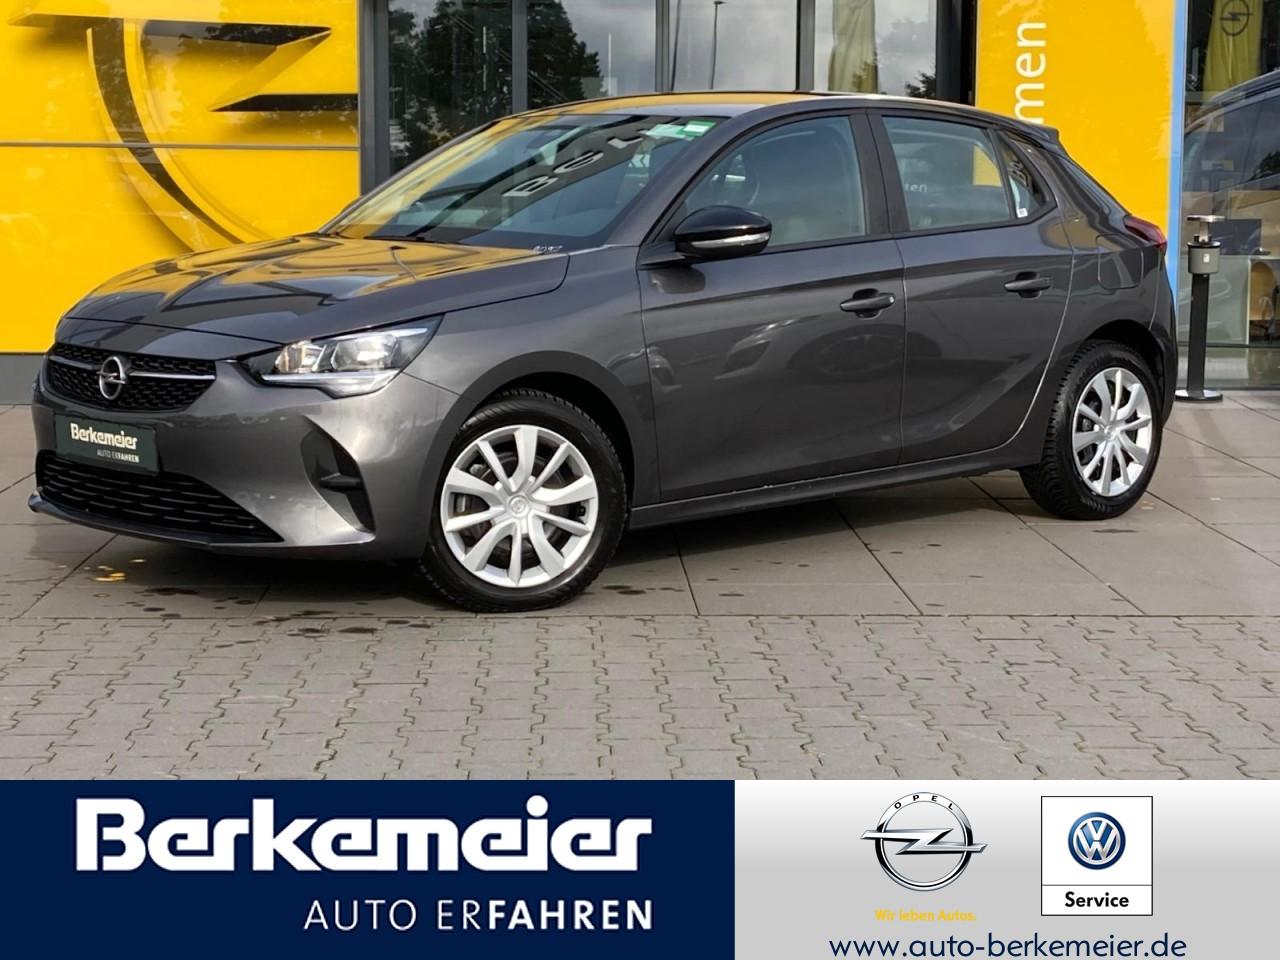 Opel Corsa F Edition *Neues Modell* Sitzheiz/Parkpilot, Jahr 2019, Benzin